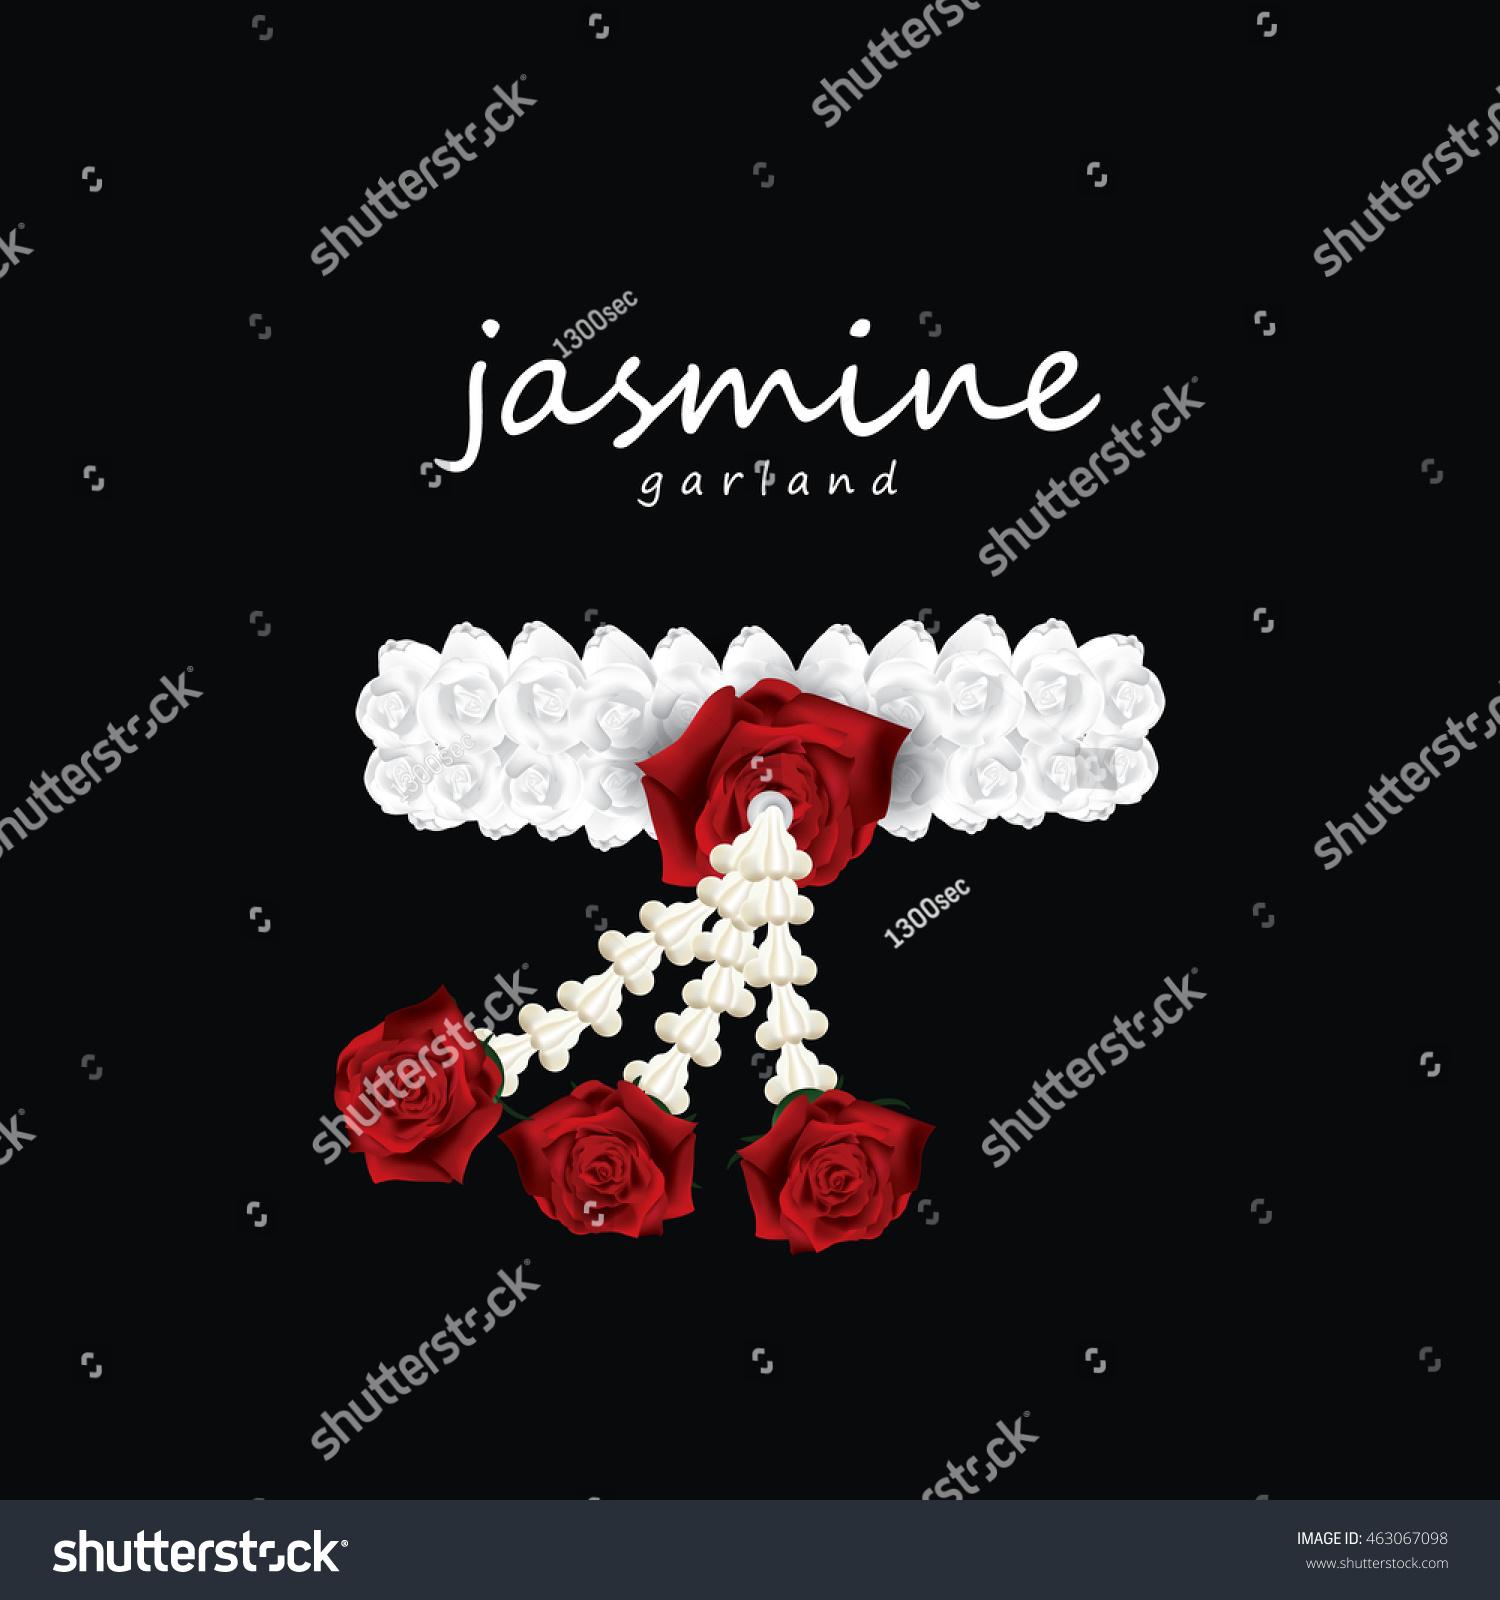 Jasmine Flower Garland Vector Illustration Stock Vector Royalty